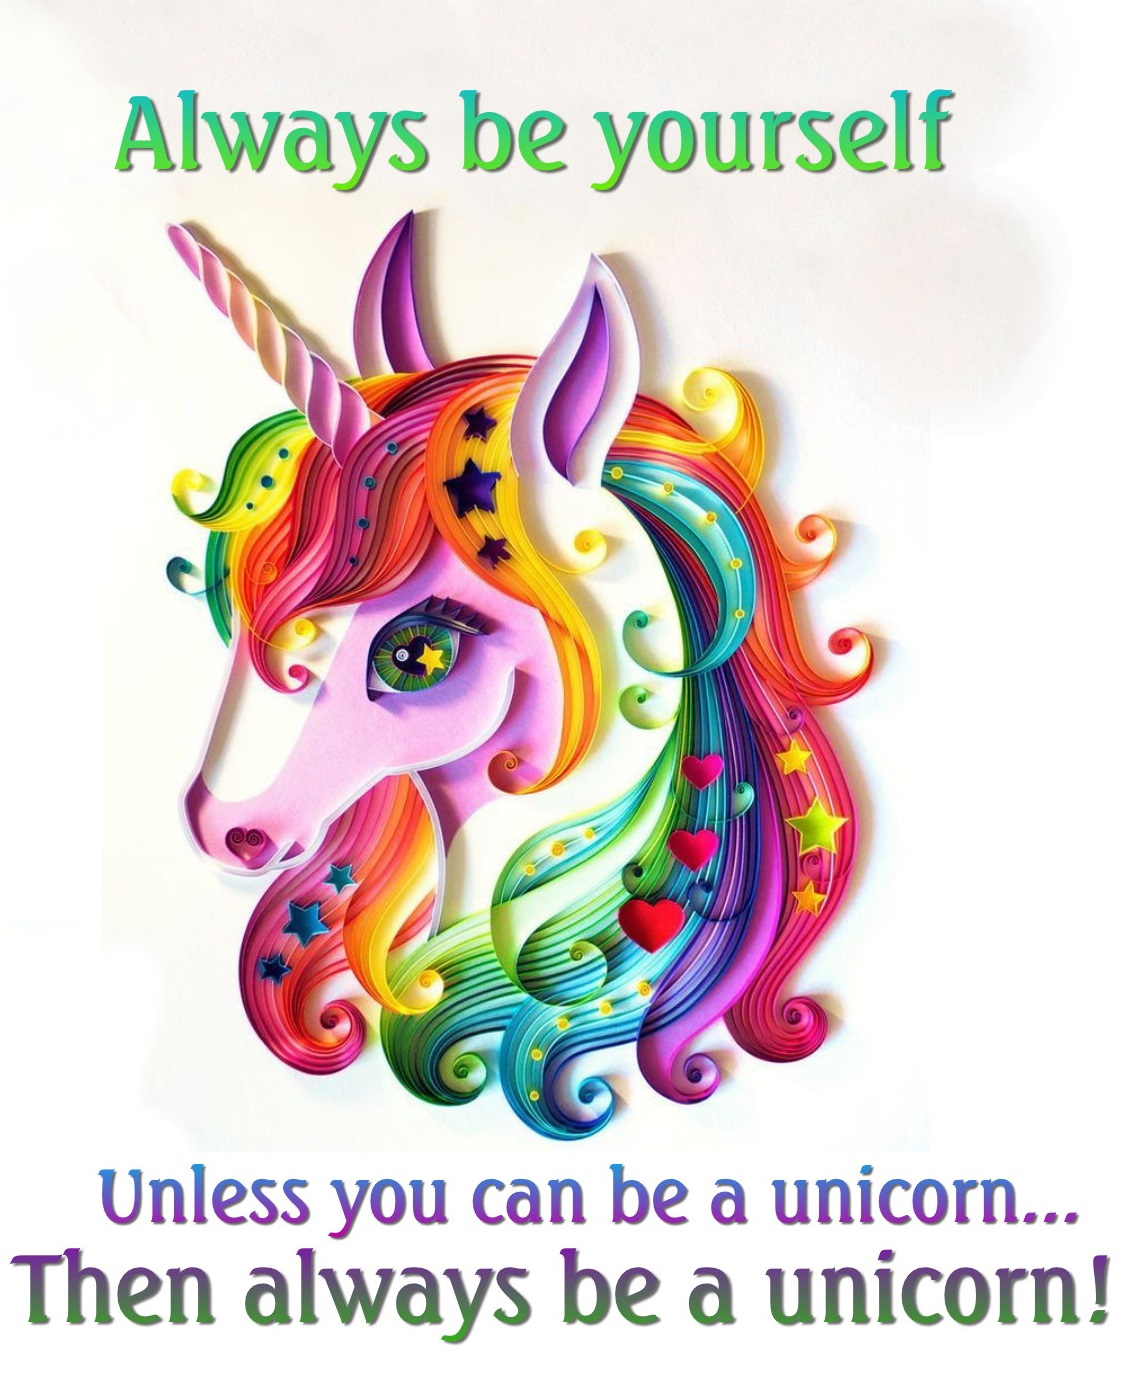 unicorn-6.jpg